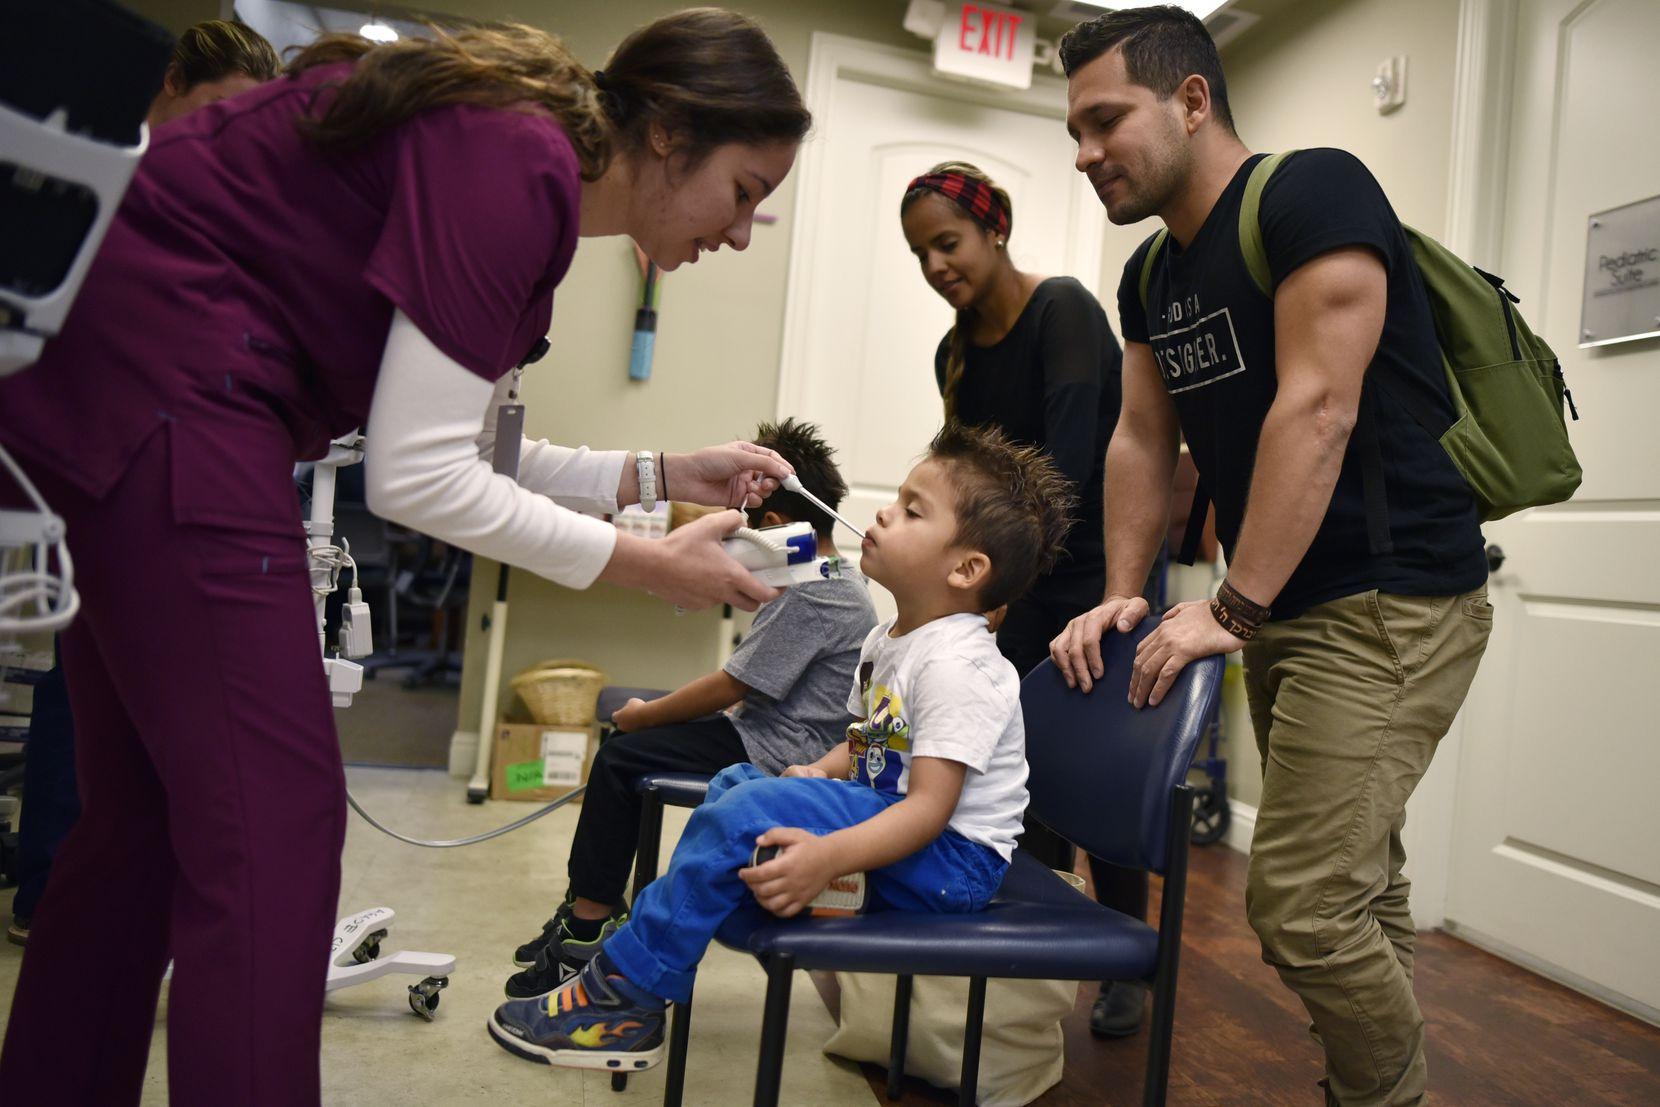 Nursing student Stephanie Beaton (left) checks the temperature of Matias Bonilla, 3, while his father, Jhonatan Bonilla, looks on at Agape Clinic in Dallas. With them is Sandra Duarte, the children's mother.